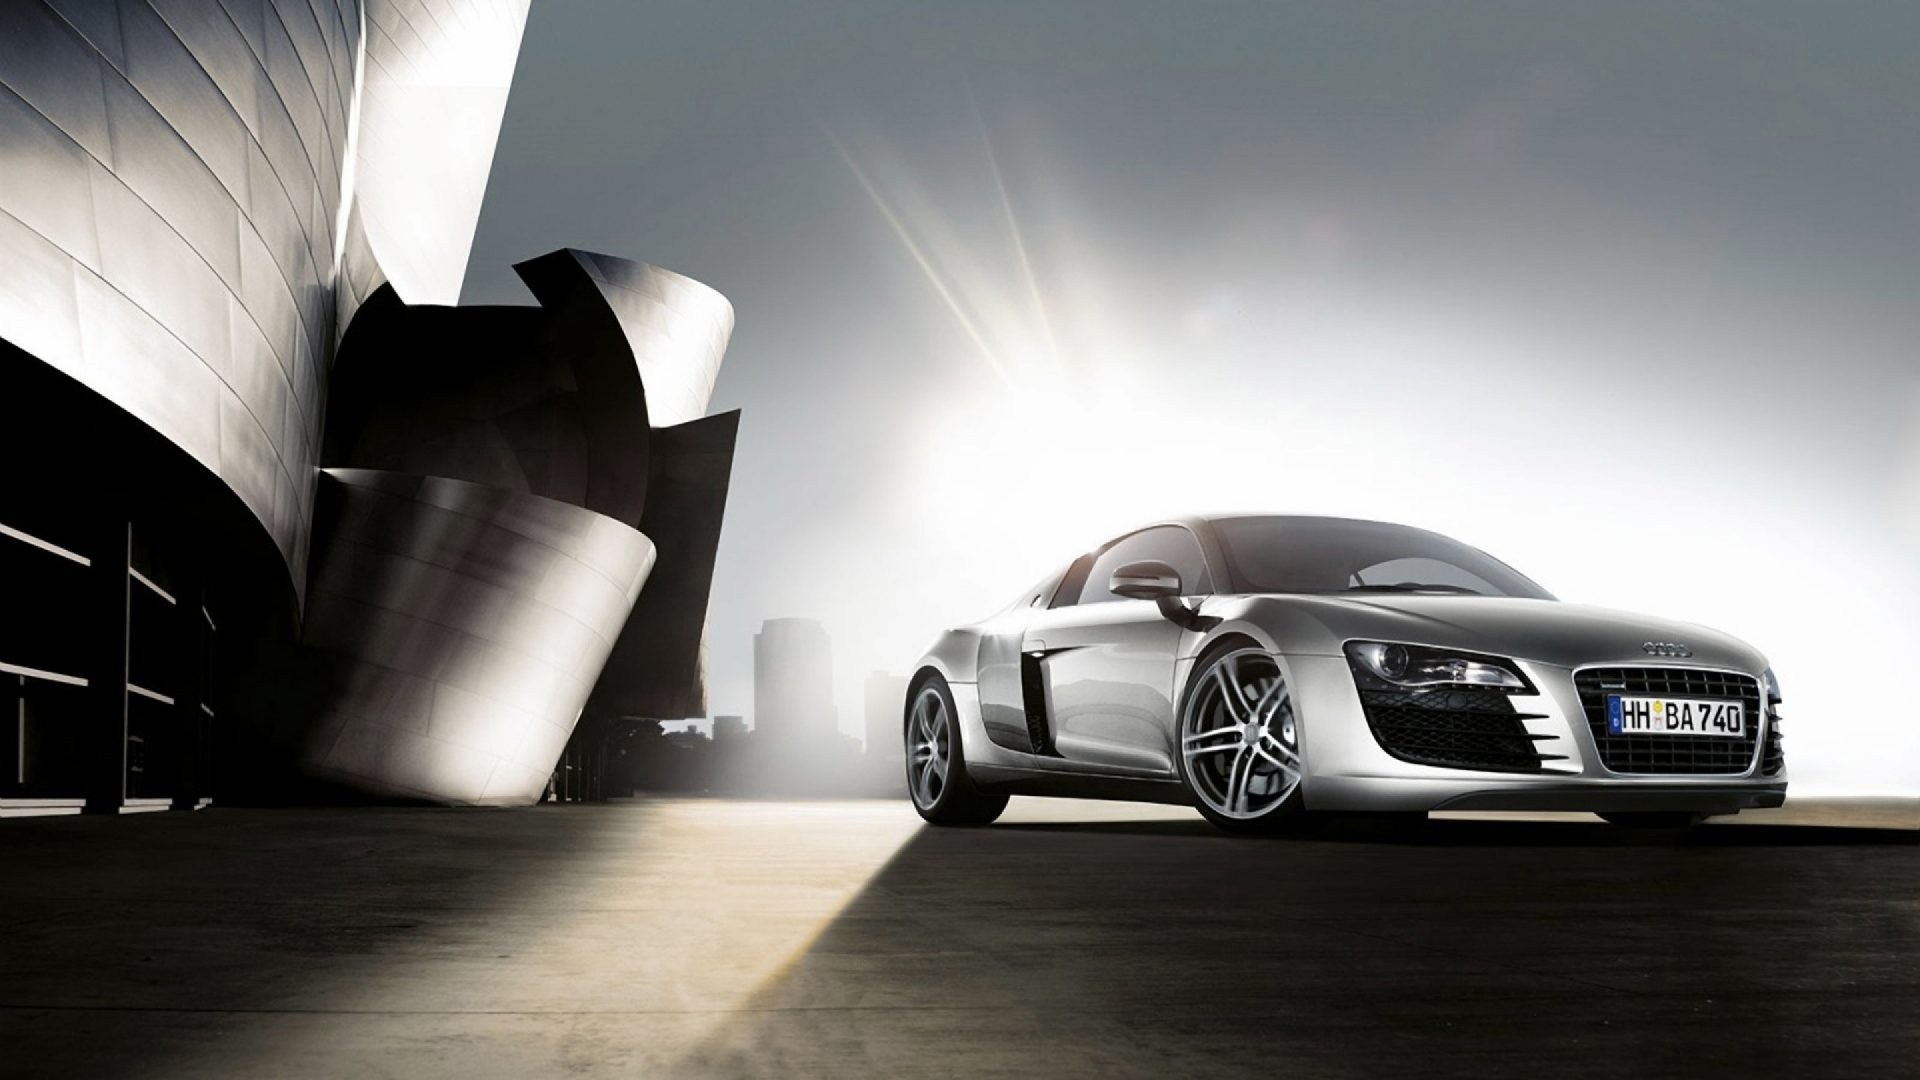 Audi R8 Front Angle 4k HD Wallpaper